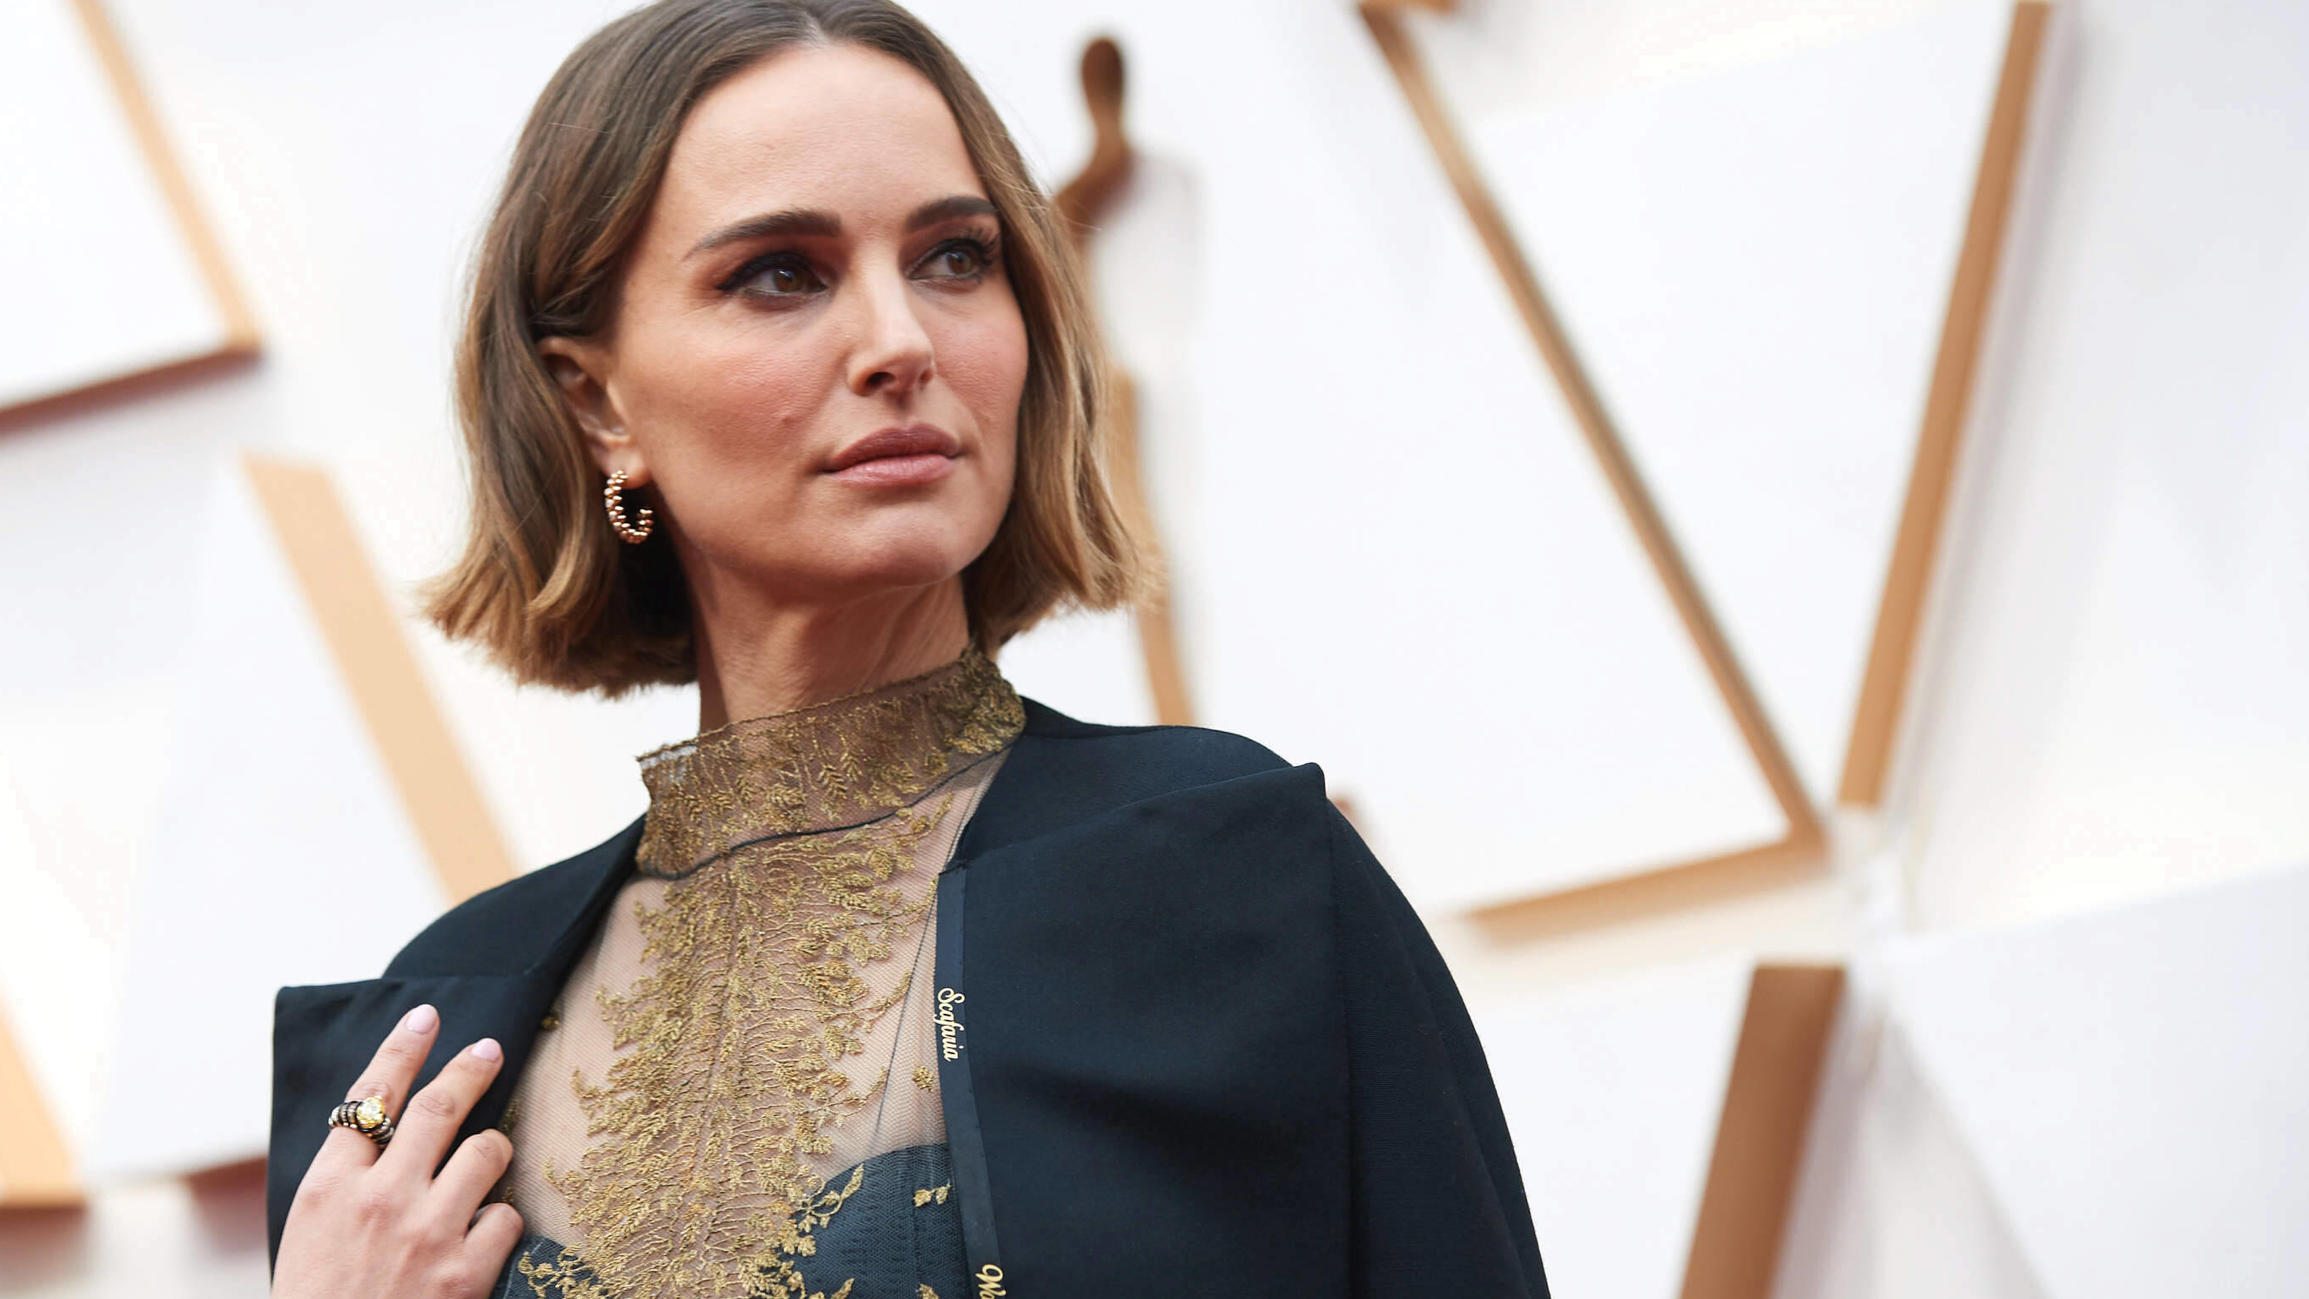 Natalie Portman wehrt sich gegen Body-Shaming - VIP.de, Star News